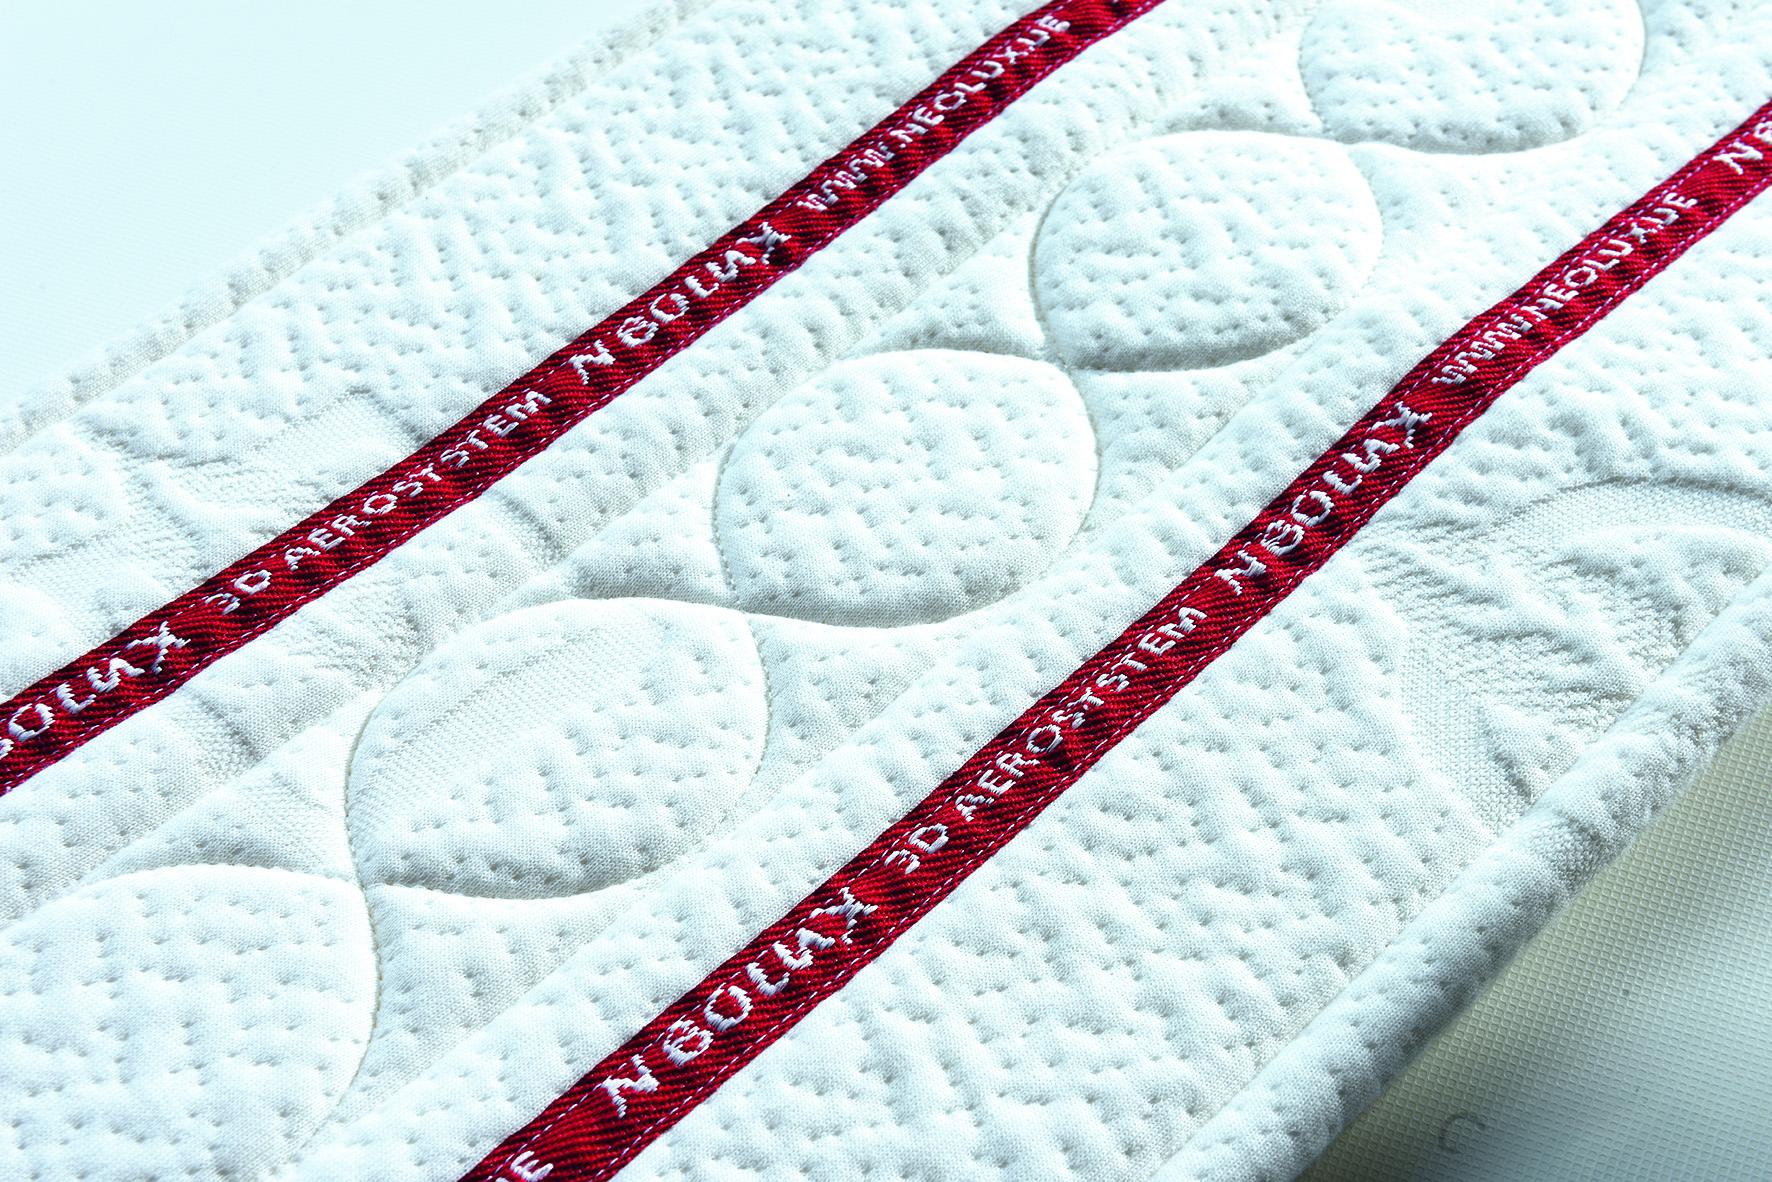 Multi-function 3D mattress border quilting machine detail